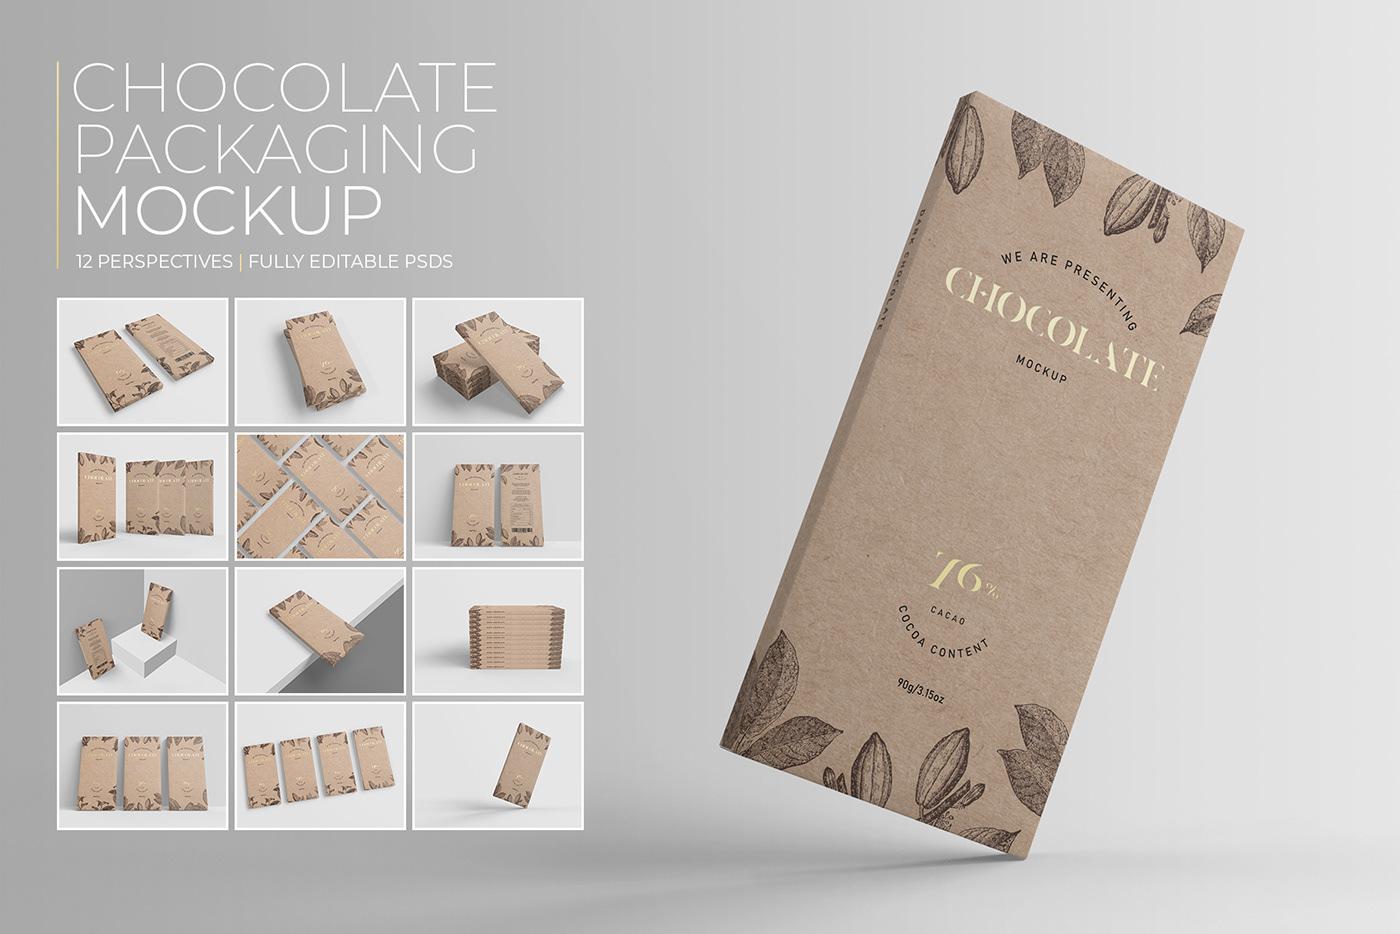 box cardboard chocolate mock up Mockup Packaging pro psd stack